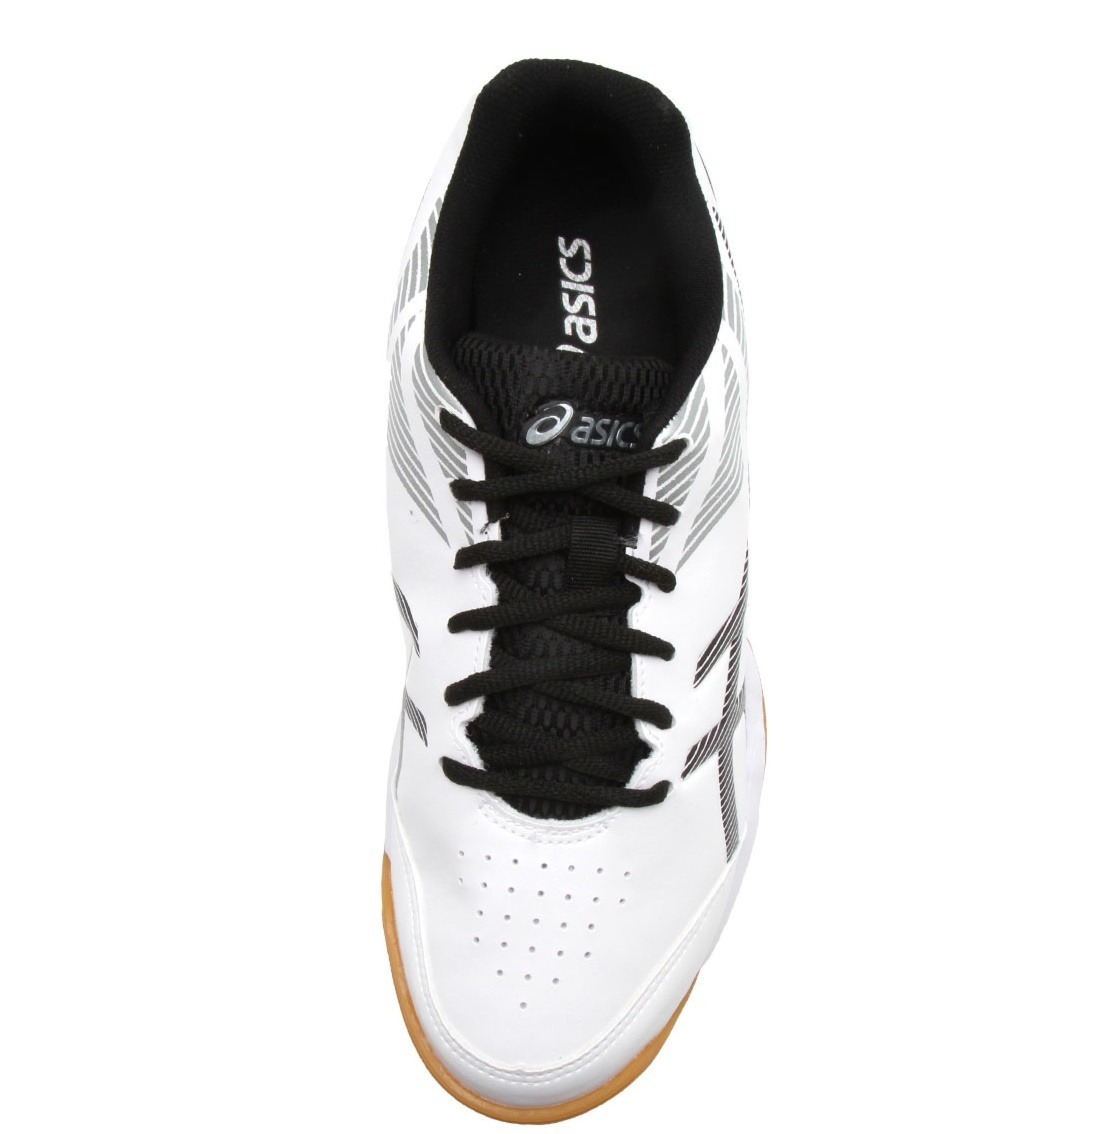 3a428197702 tenis asics gel toque br futsal tenis volei masculino branco. Carregando  zoom.